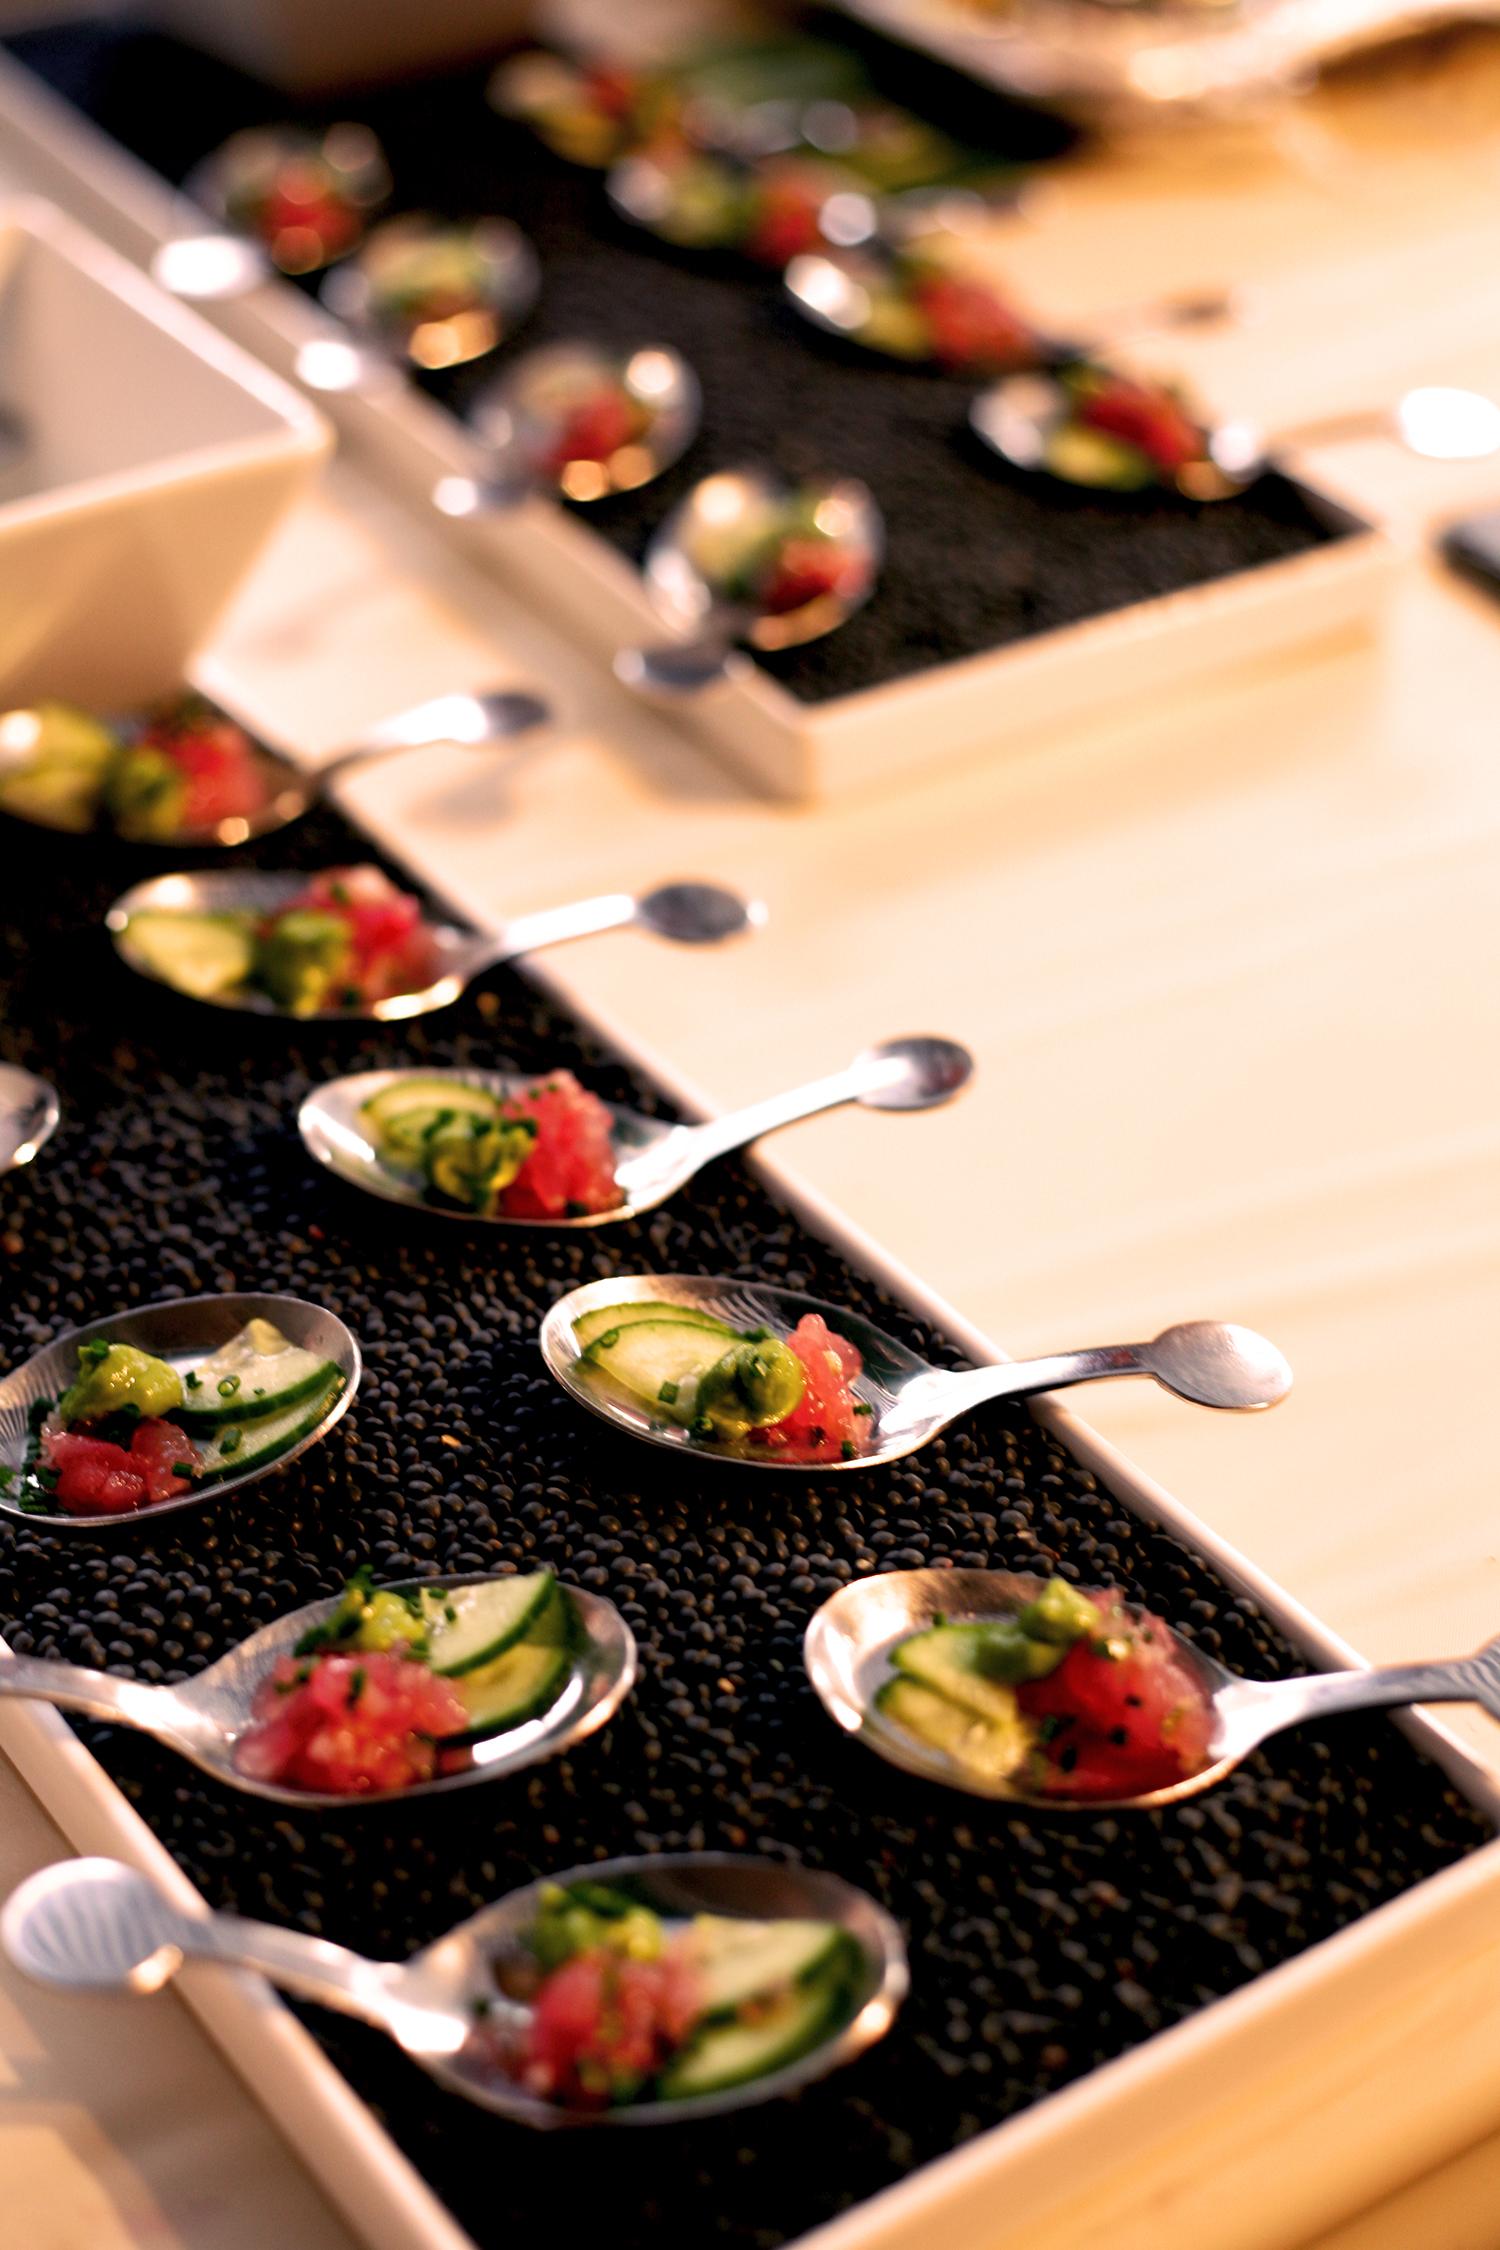 Tuna tartare, Persian cucumber, avocado, jalapeno, yuzu